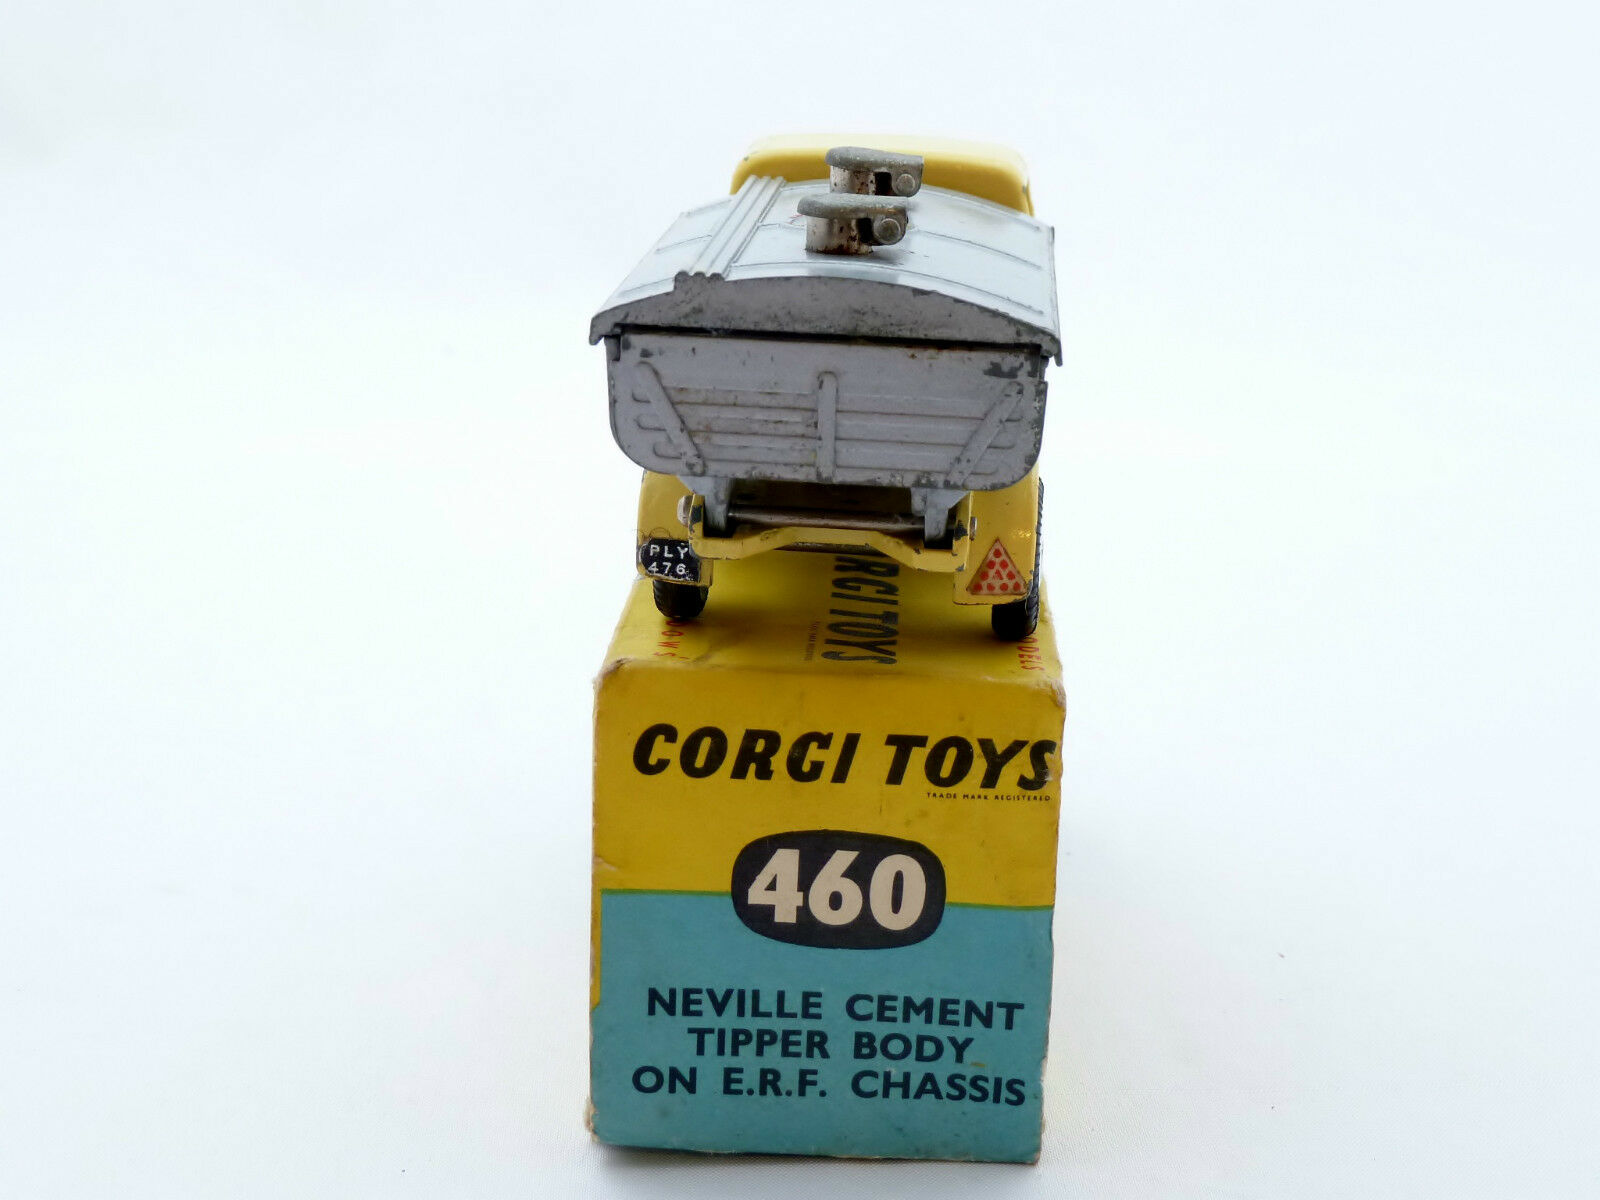 CORGI CORGI CORGI 460 NEVILLE CEMENT TIPPER BODY ON E.R.F. CHASSIS 5dac76